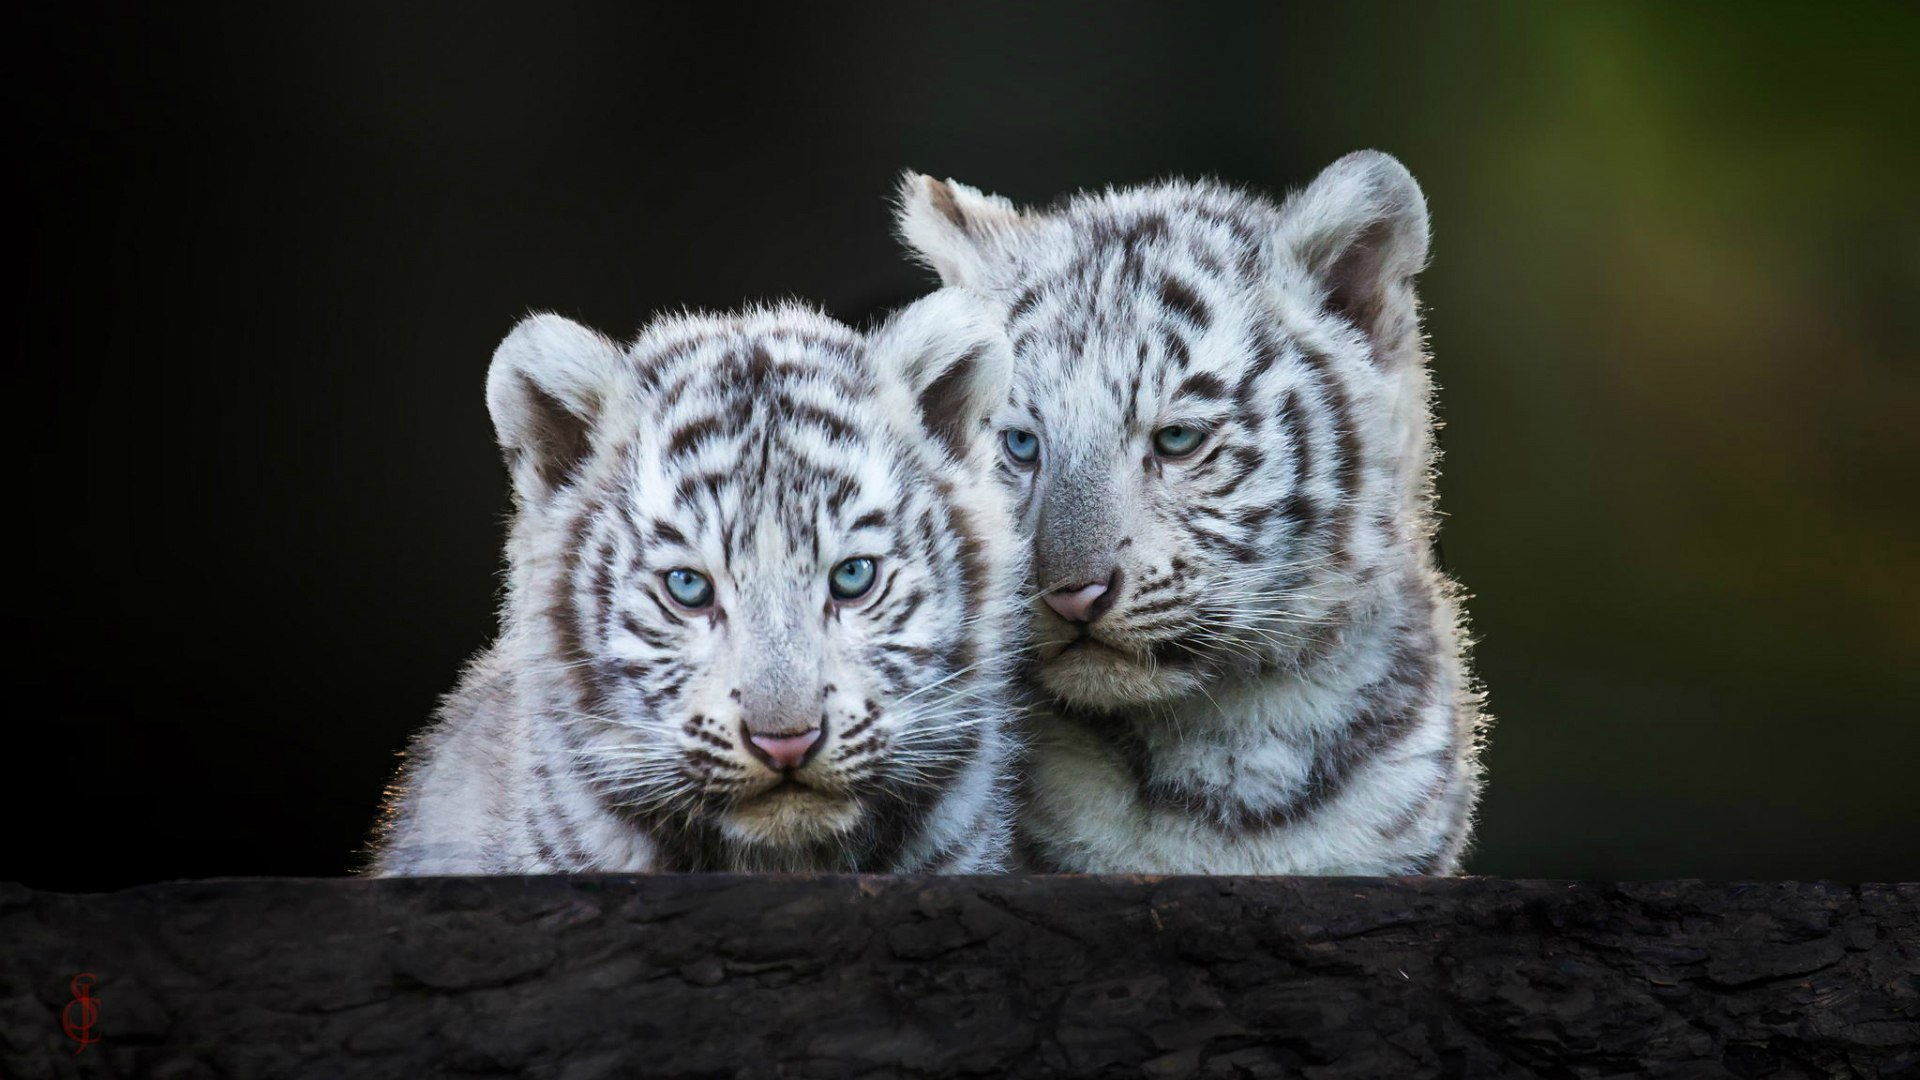 Обои с милыми тигрятами на рабочий стол